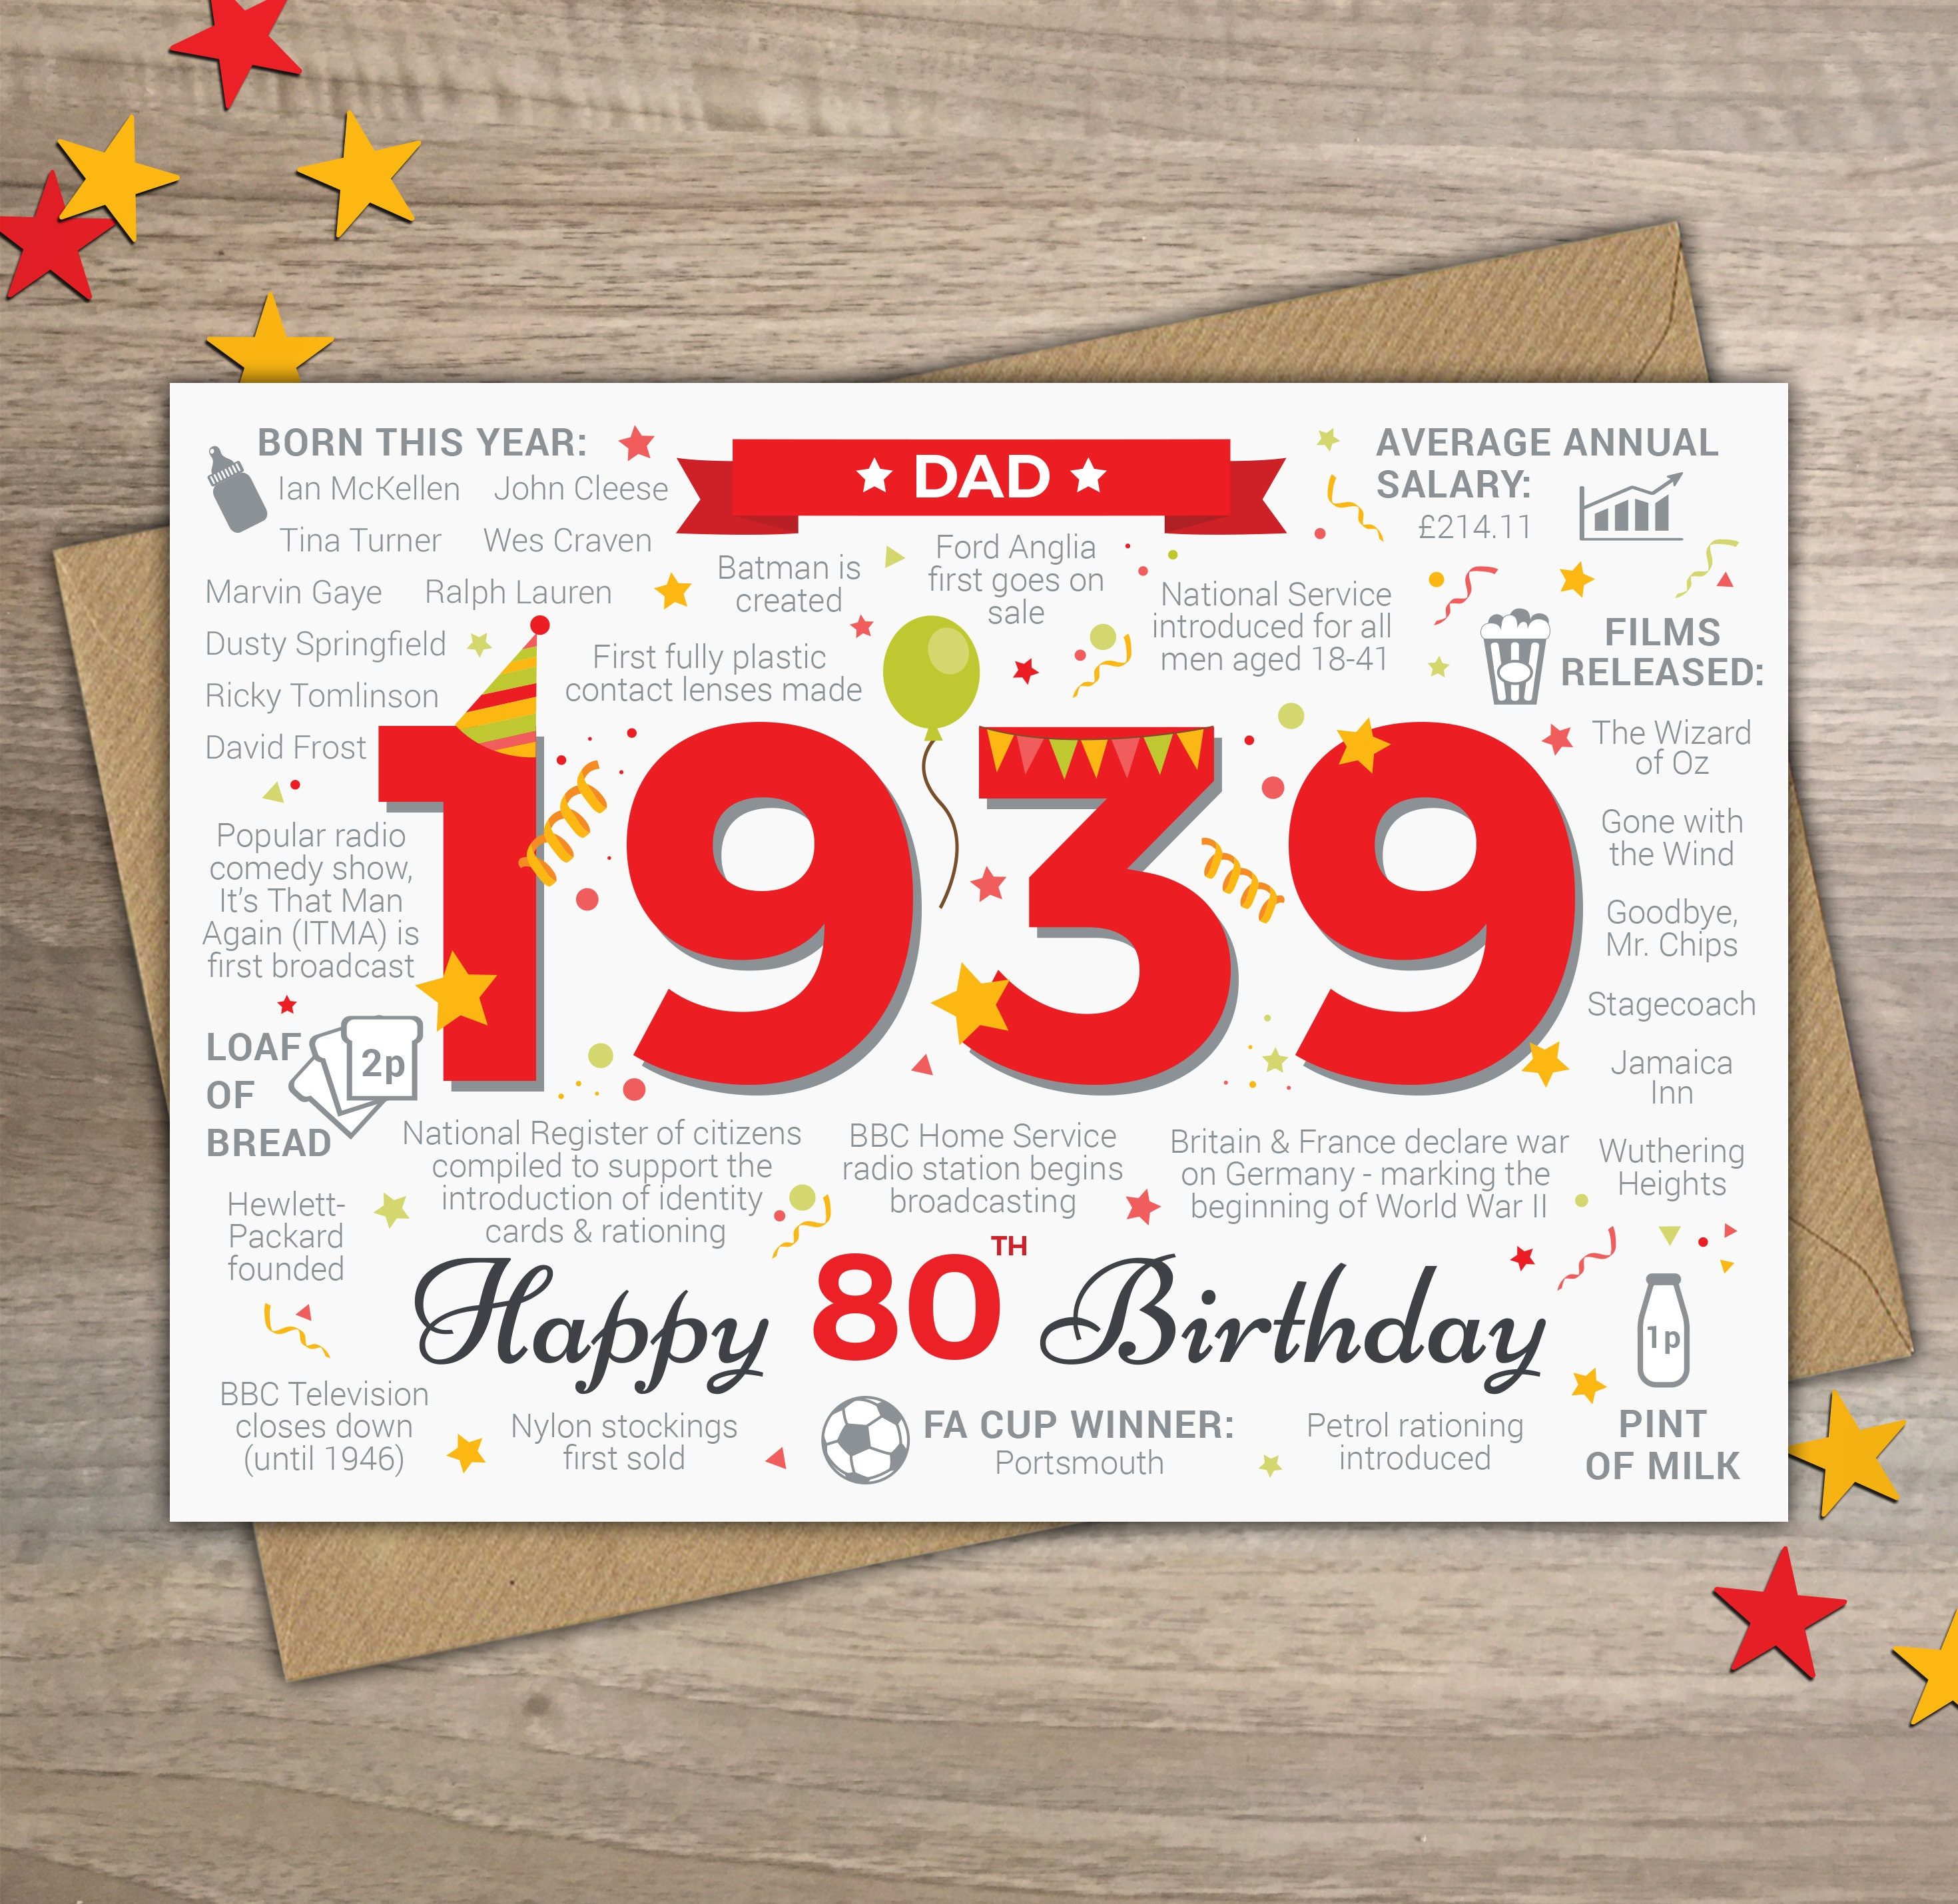 Happy 80th Birthday DAD Greetings Card Born In 1939 British